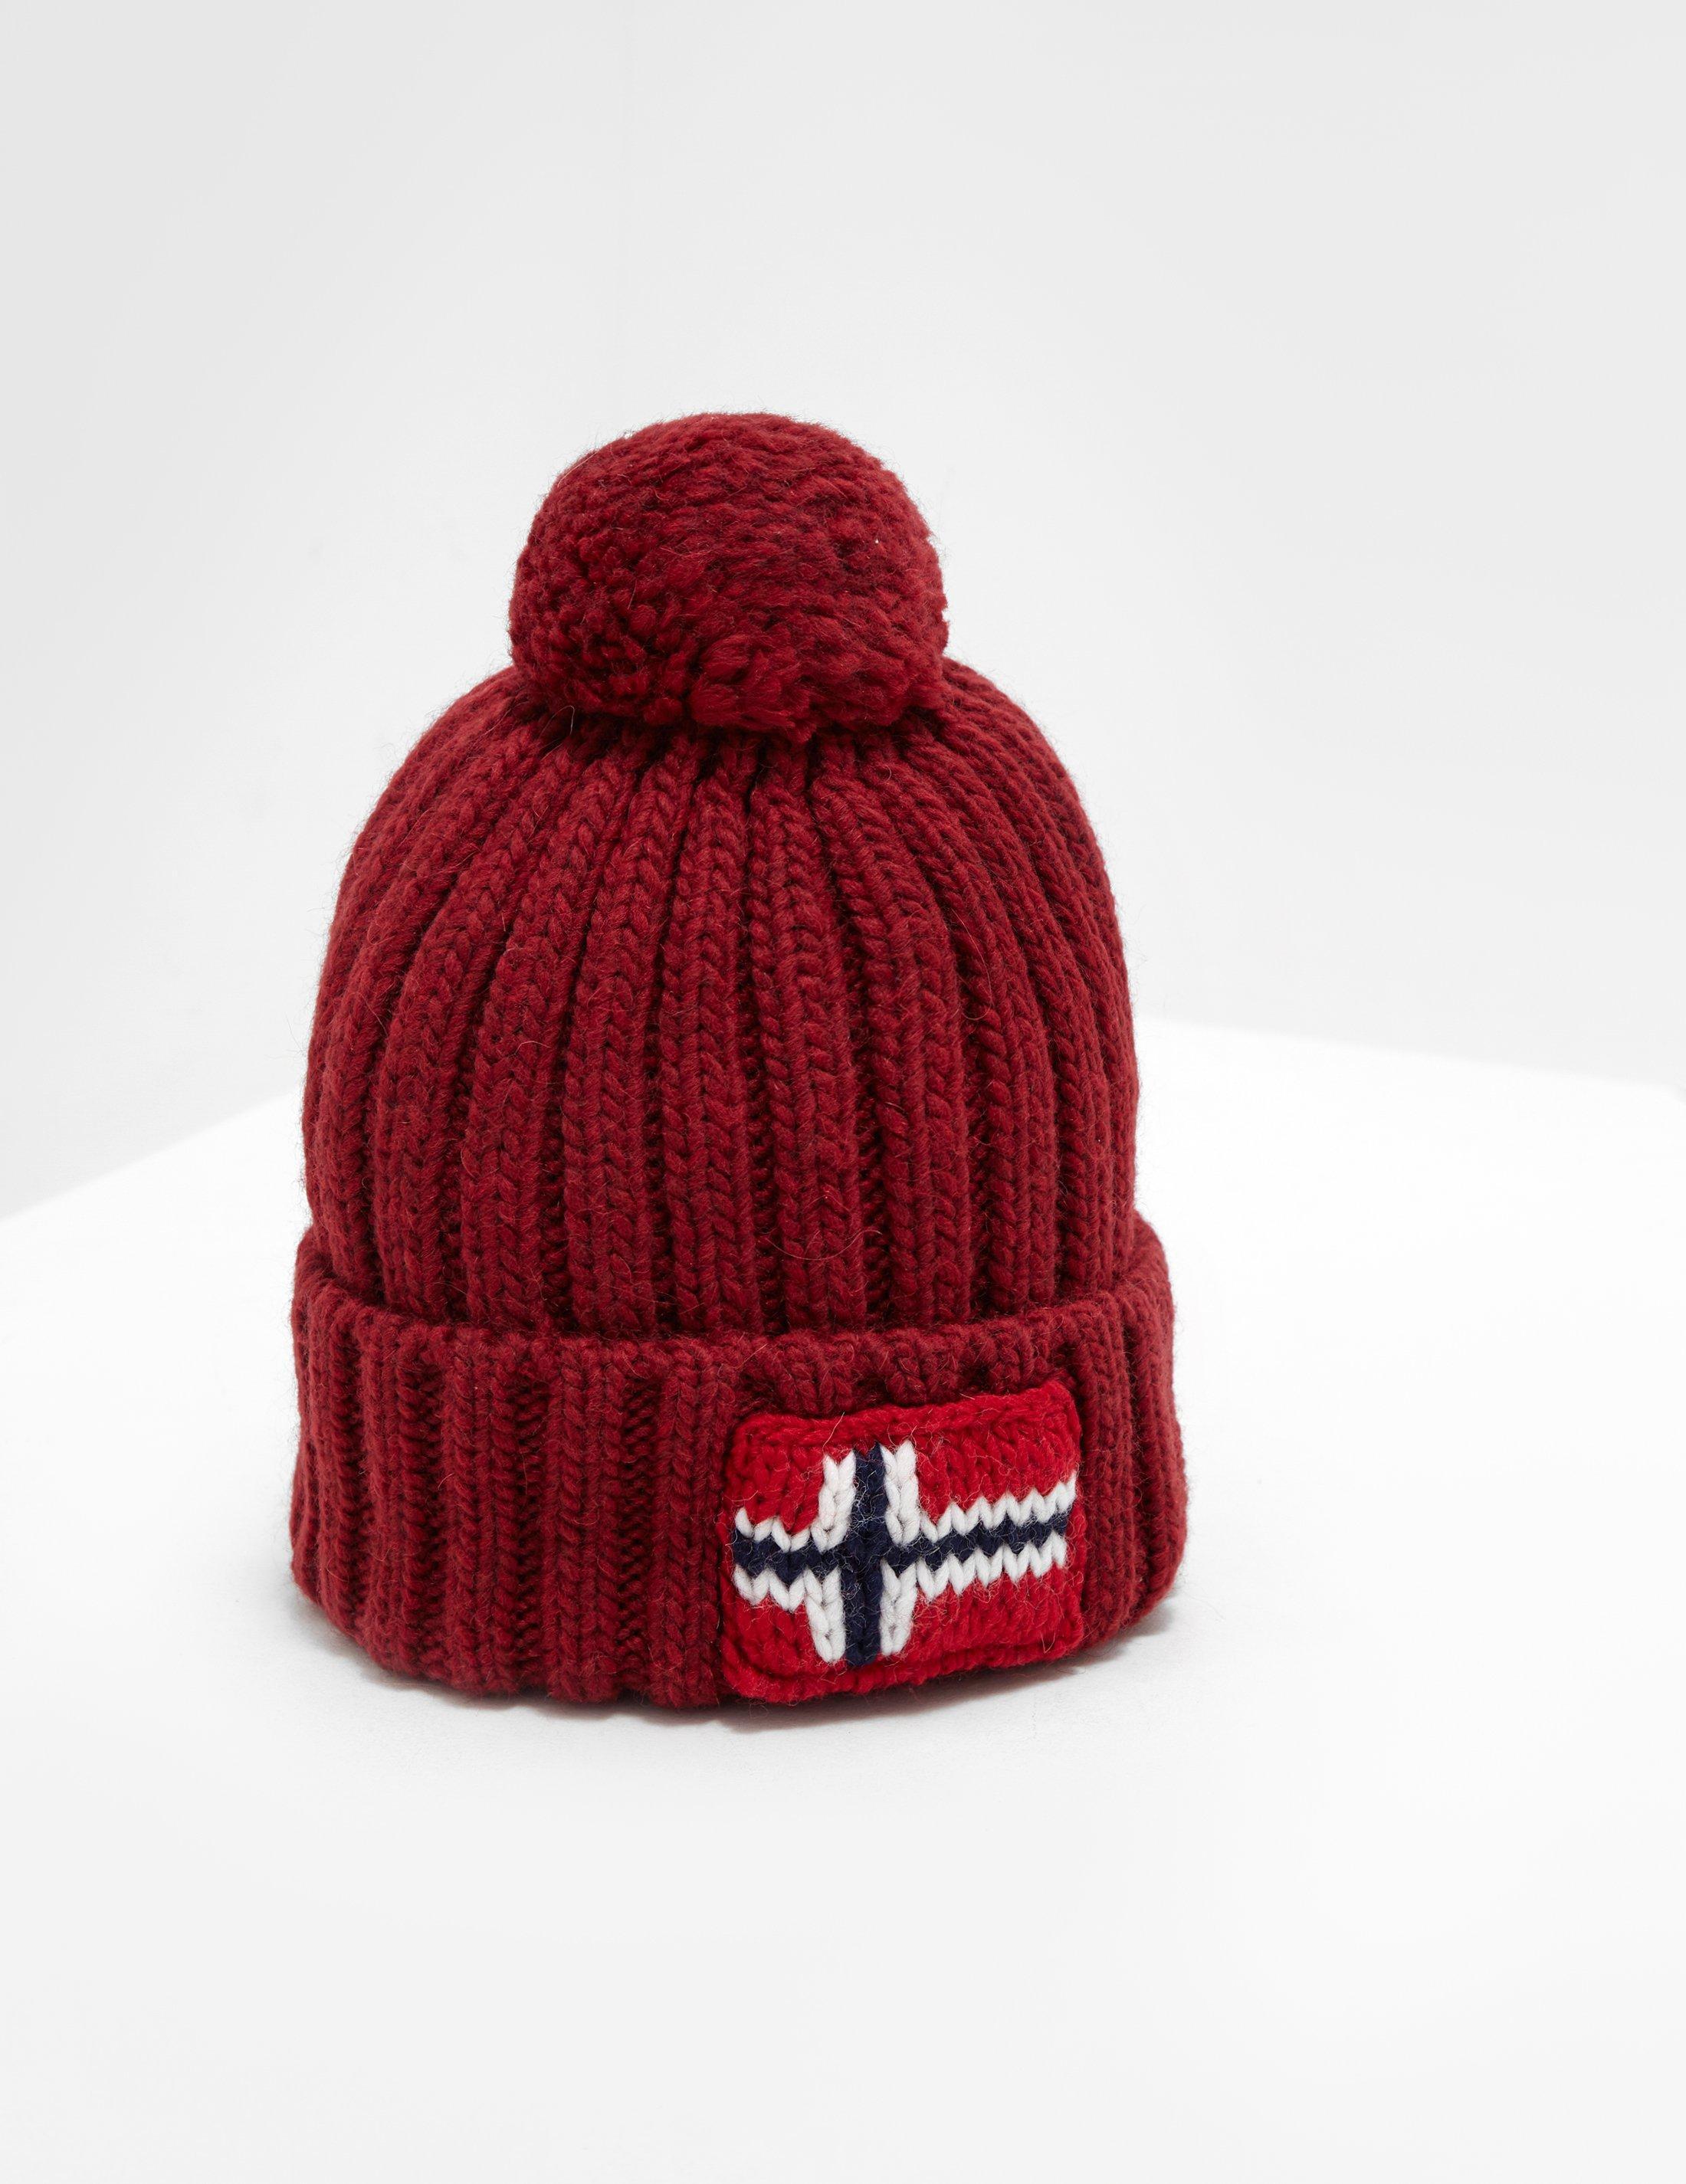 Napapijri Semiury Bobble Hat Burgundy burgundy in Red for Men - Lyst 2c1844261a6